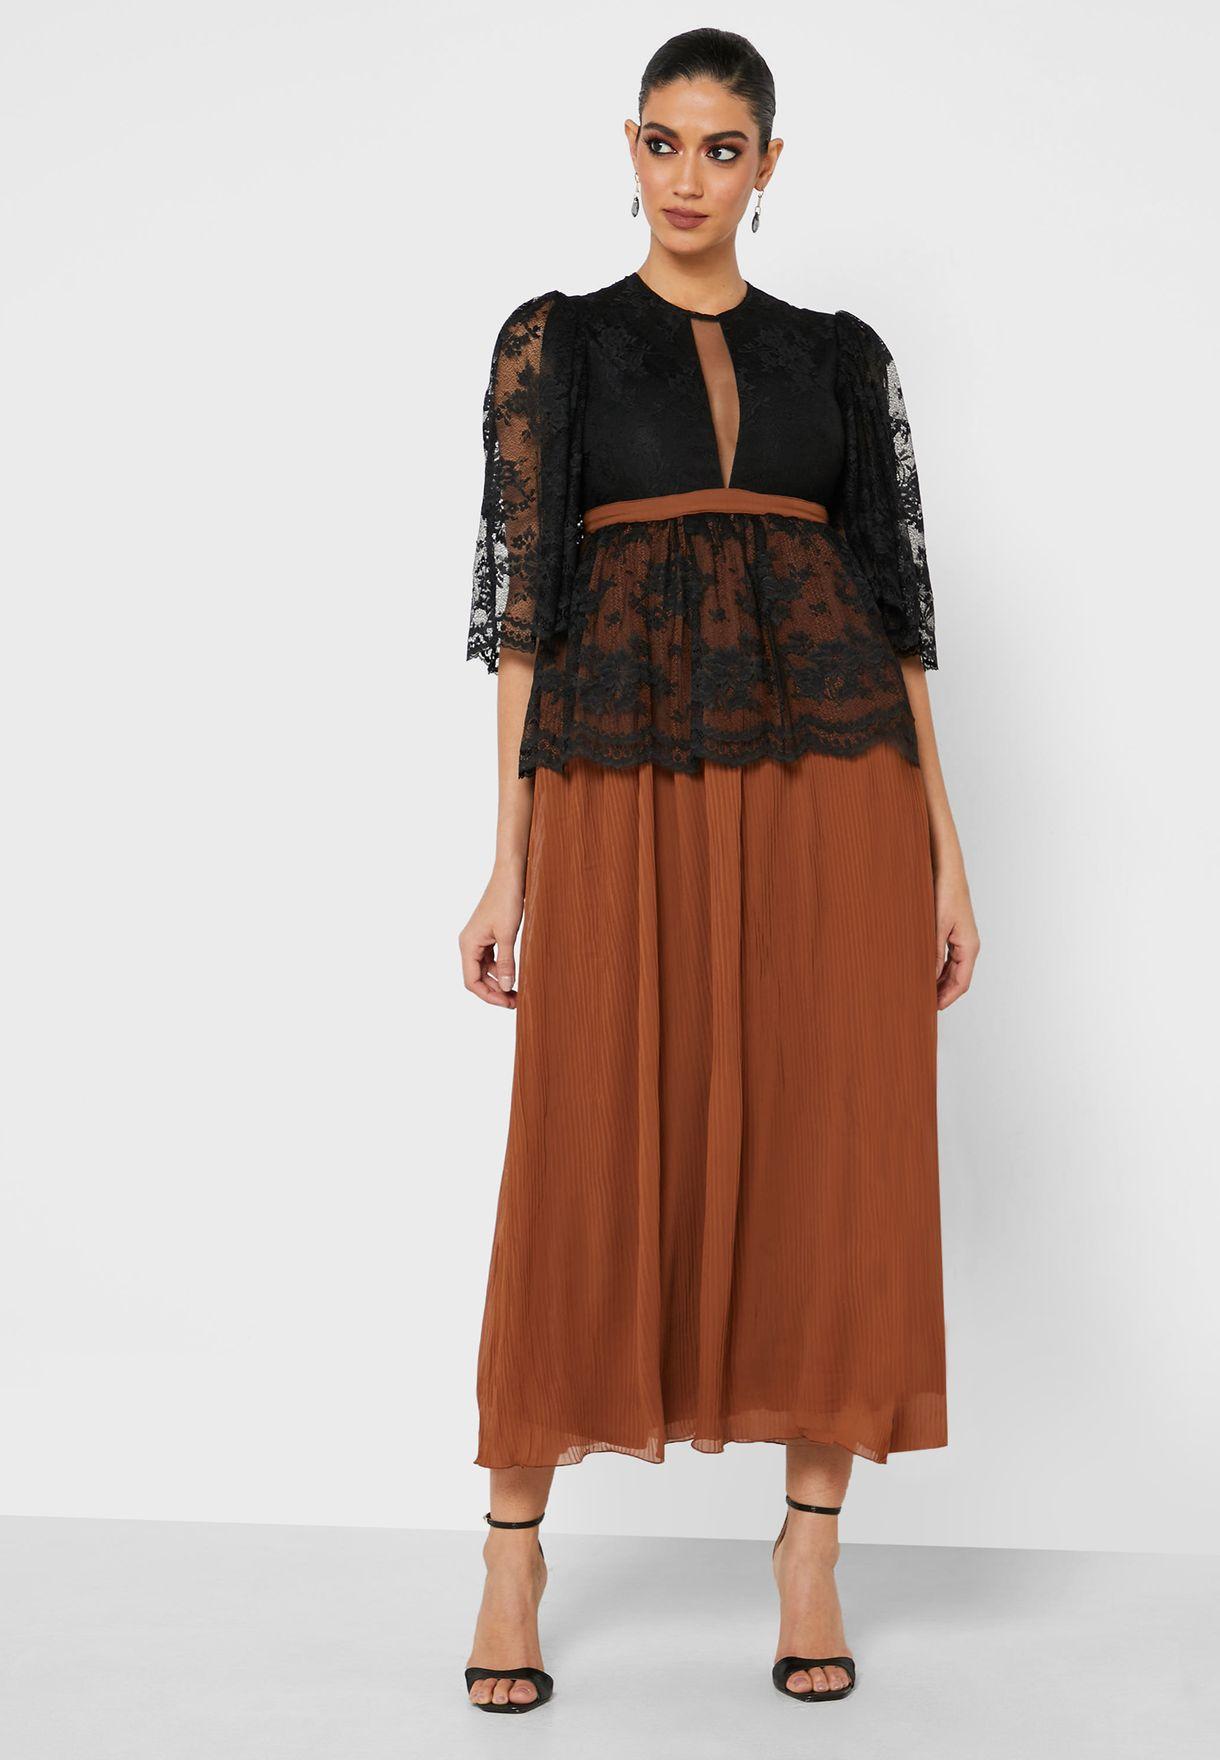 Lace Jacket Pleated Skirt Dress